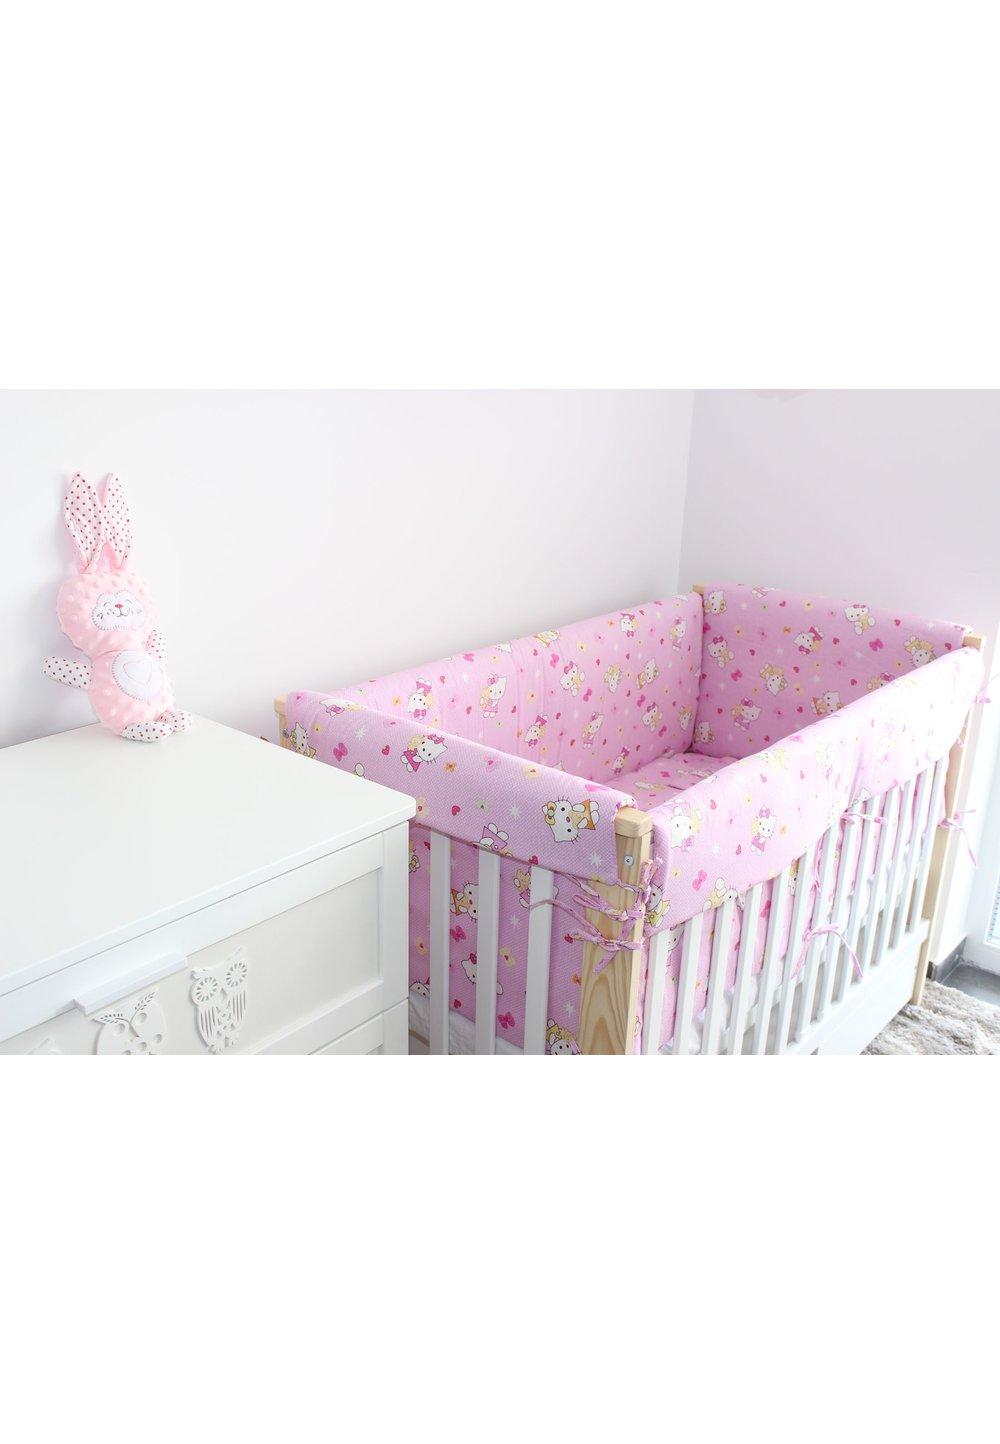 Lenjerie patut 7 piese, Maxi, Hello Kitty, roz deschis, 120x60cm imagine